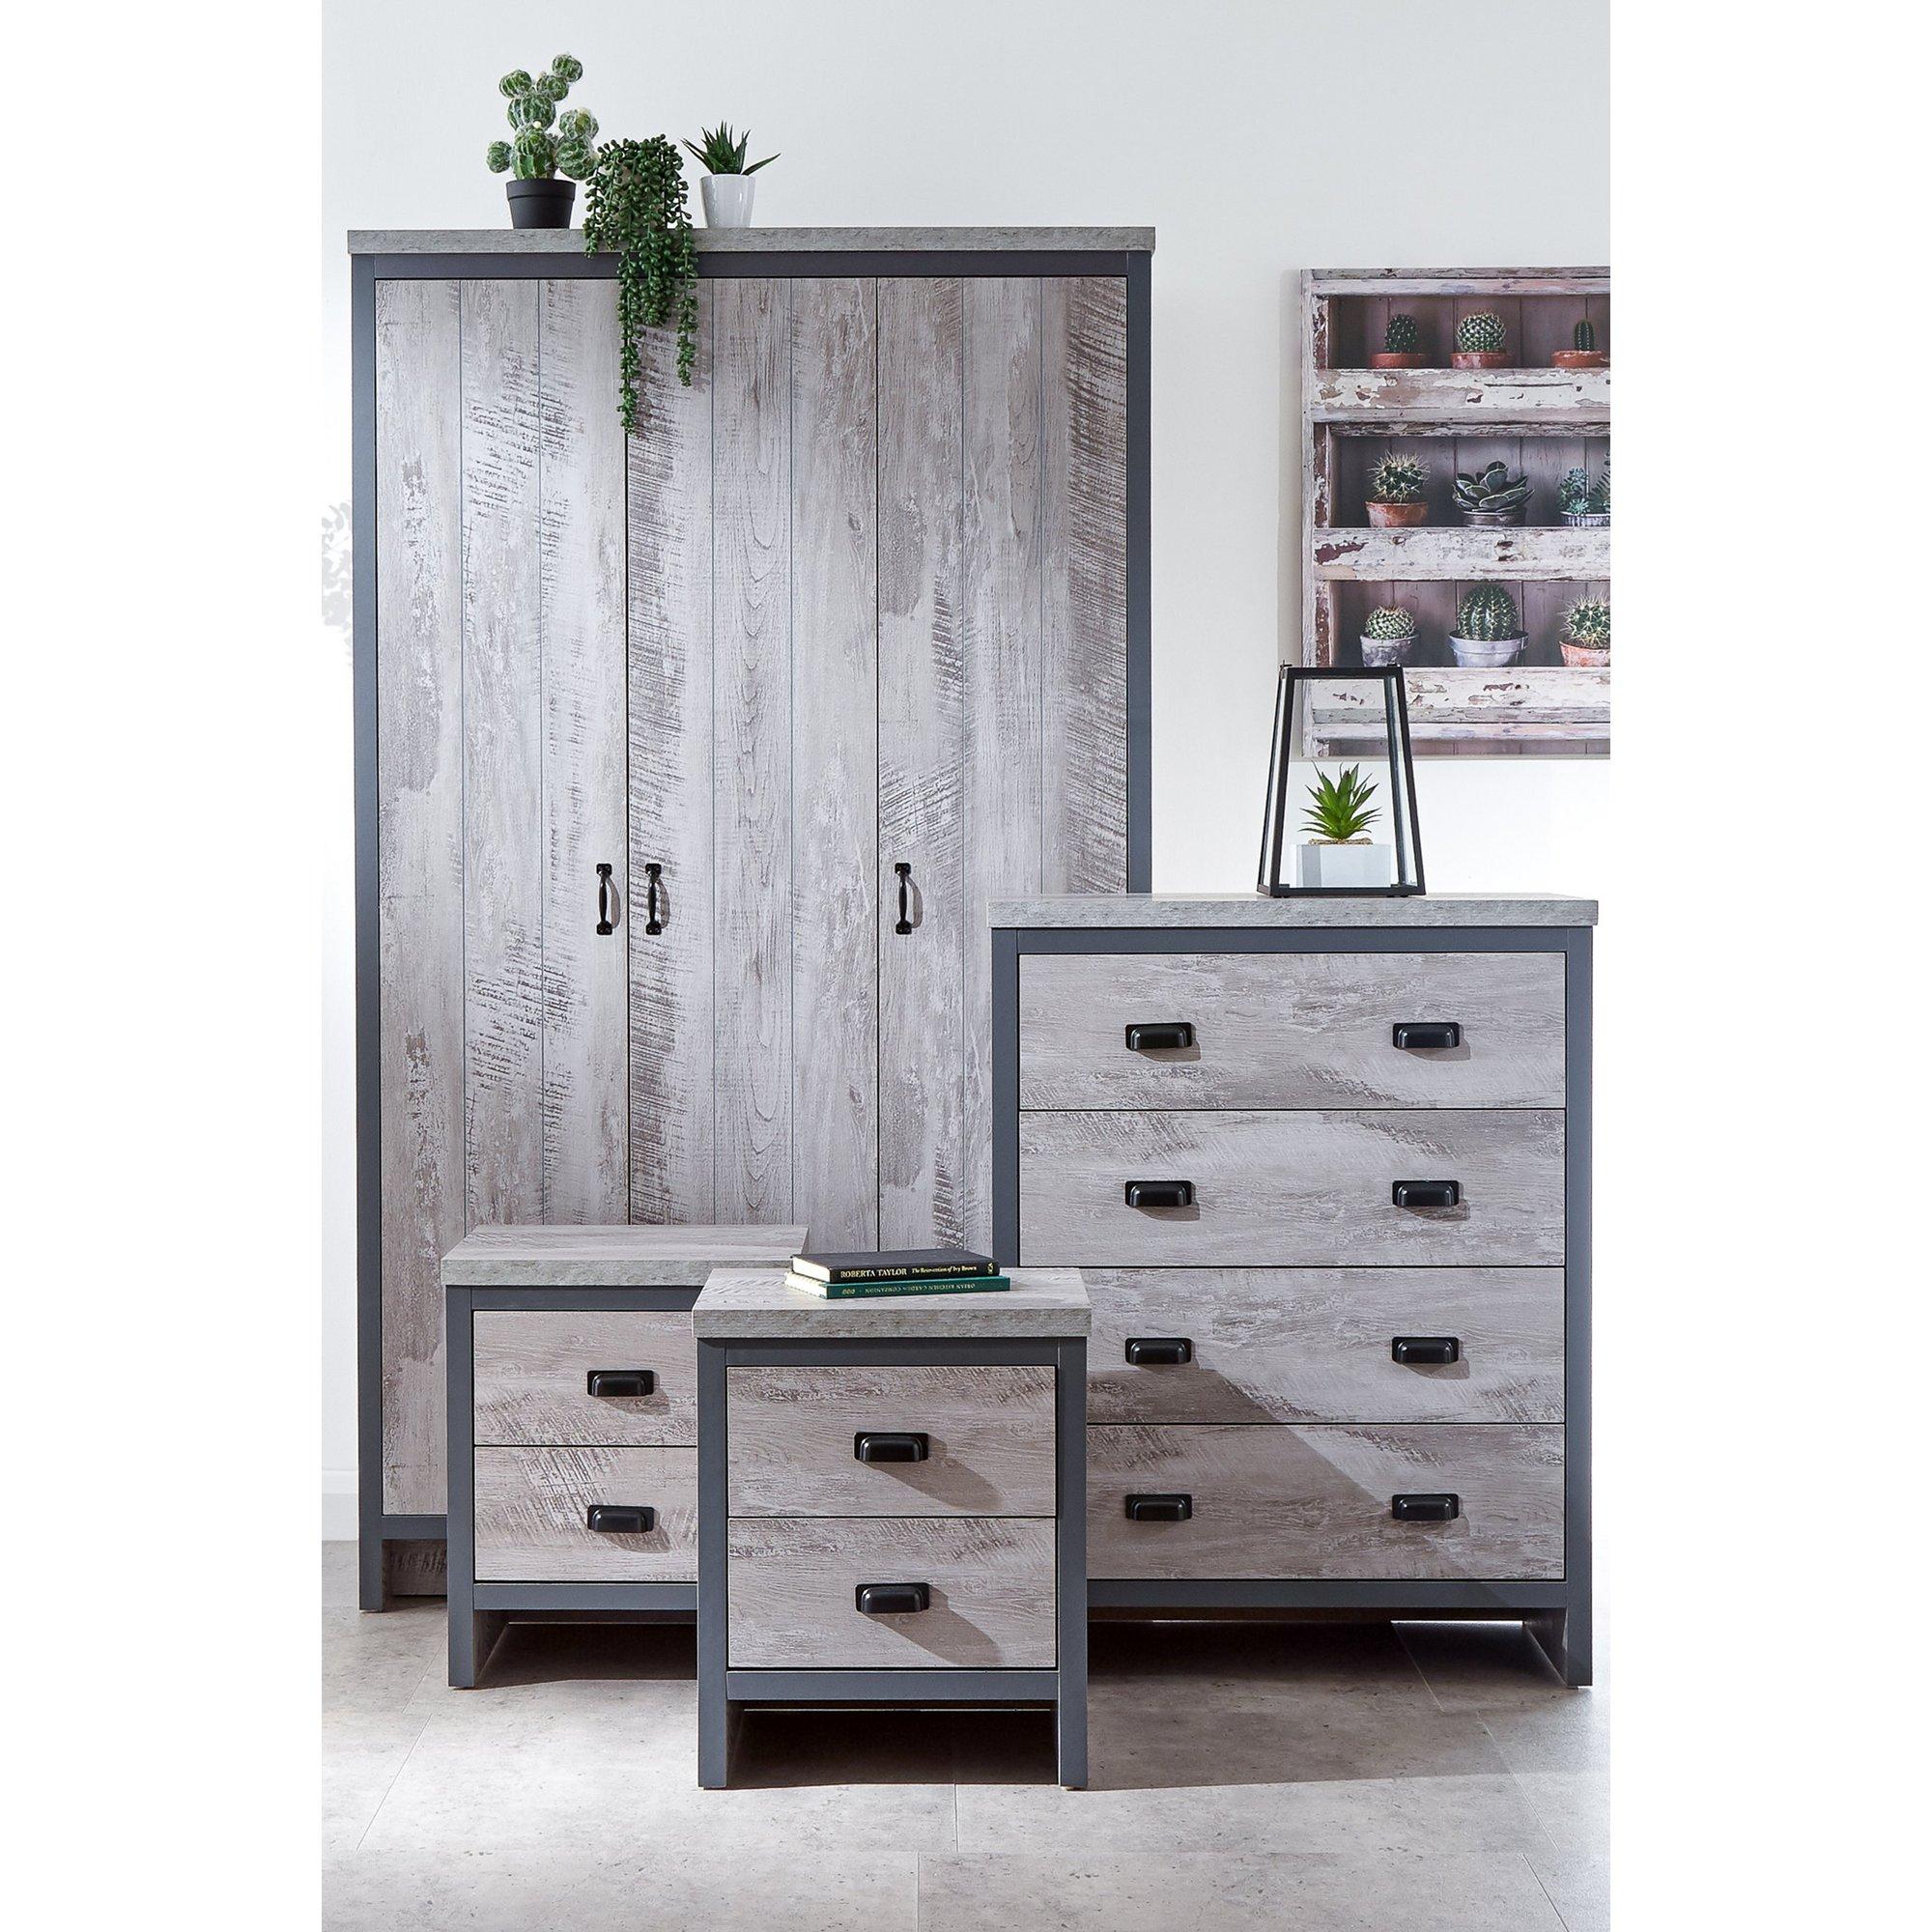 Image of Boston 4 Piece Bedroom Set